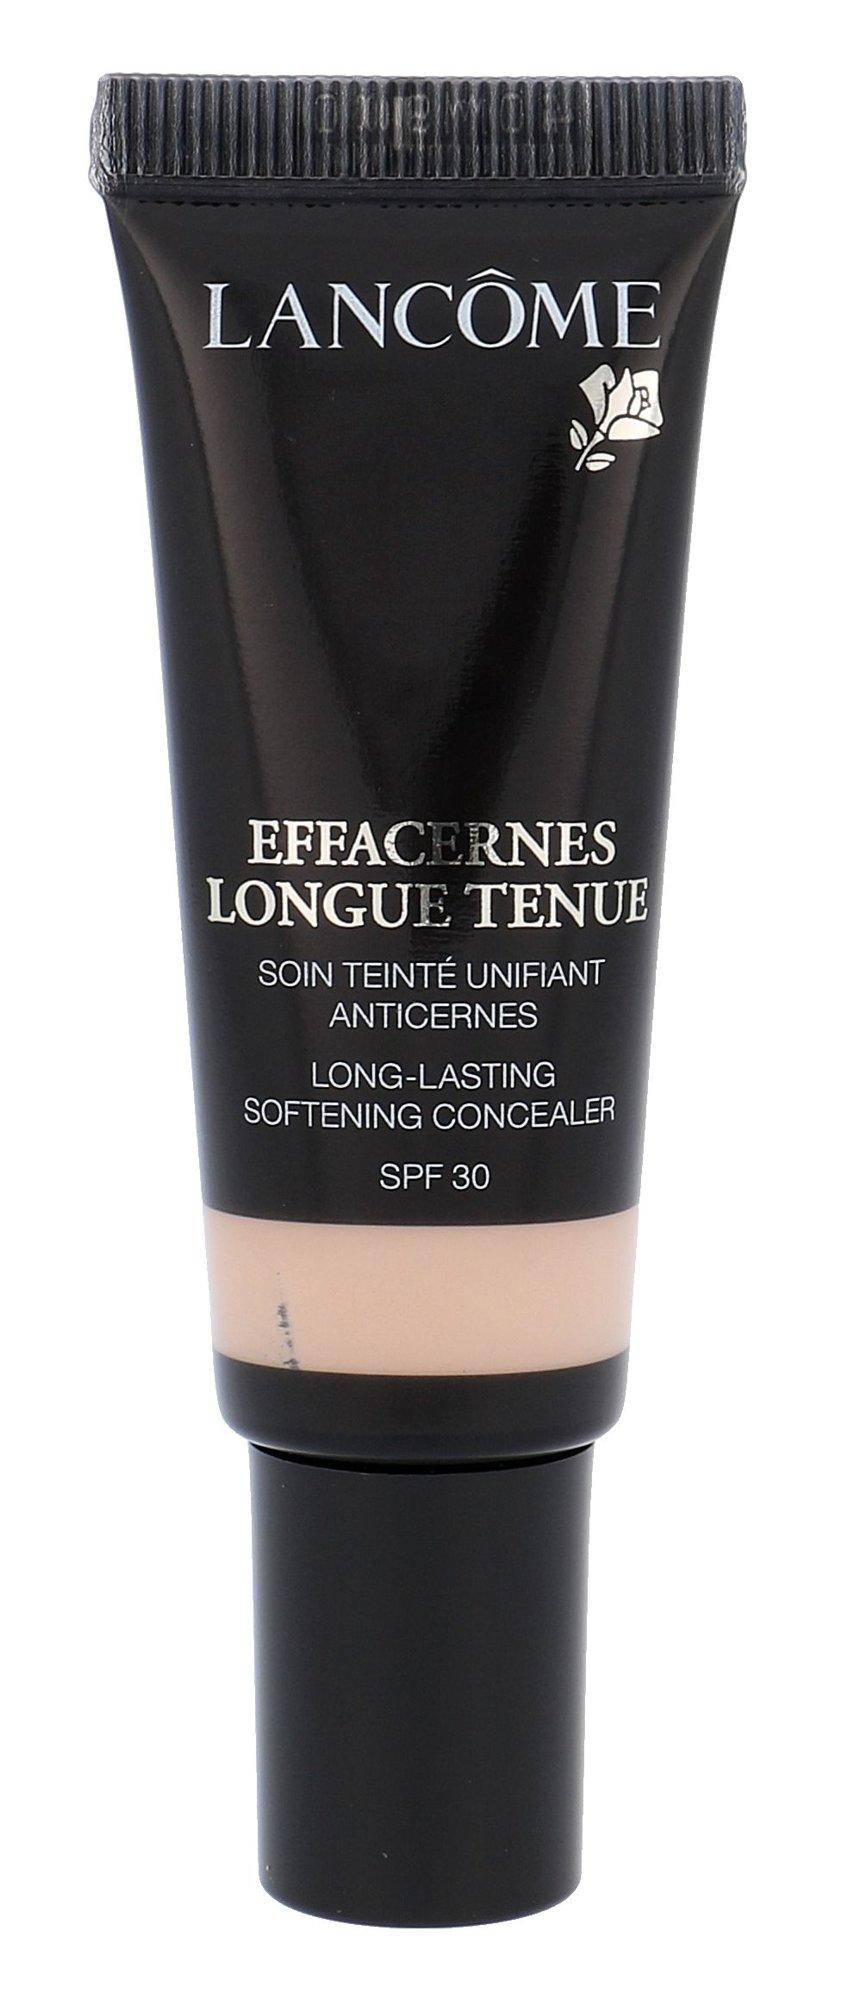 Lancôme Effacernes Longue Tenue Cosmetic 15ml 01 Beige Pastel